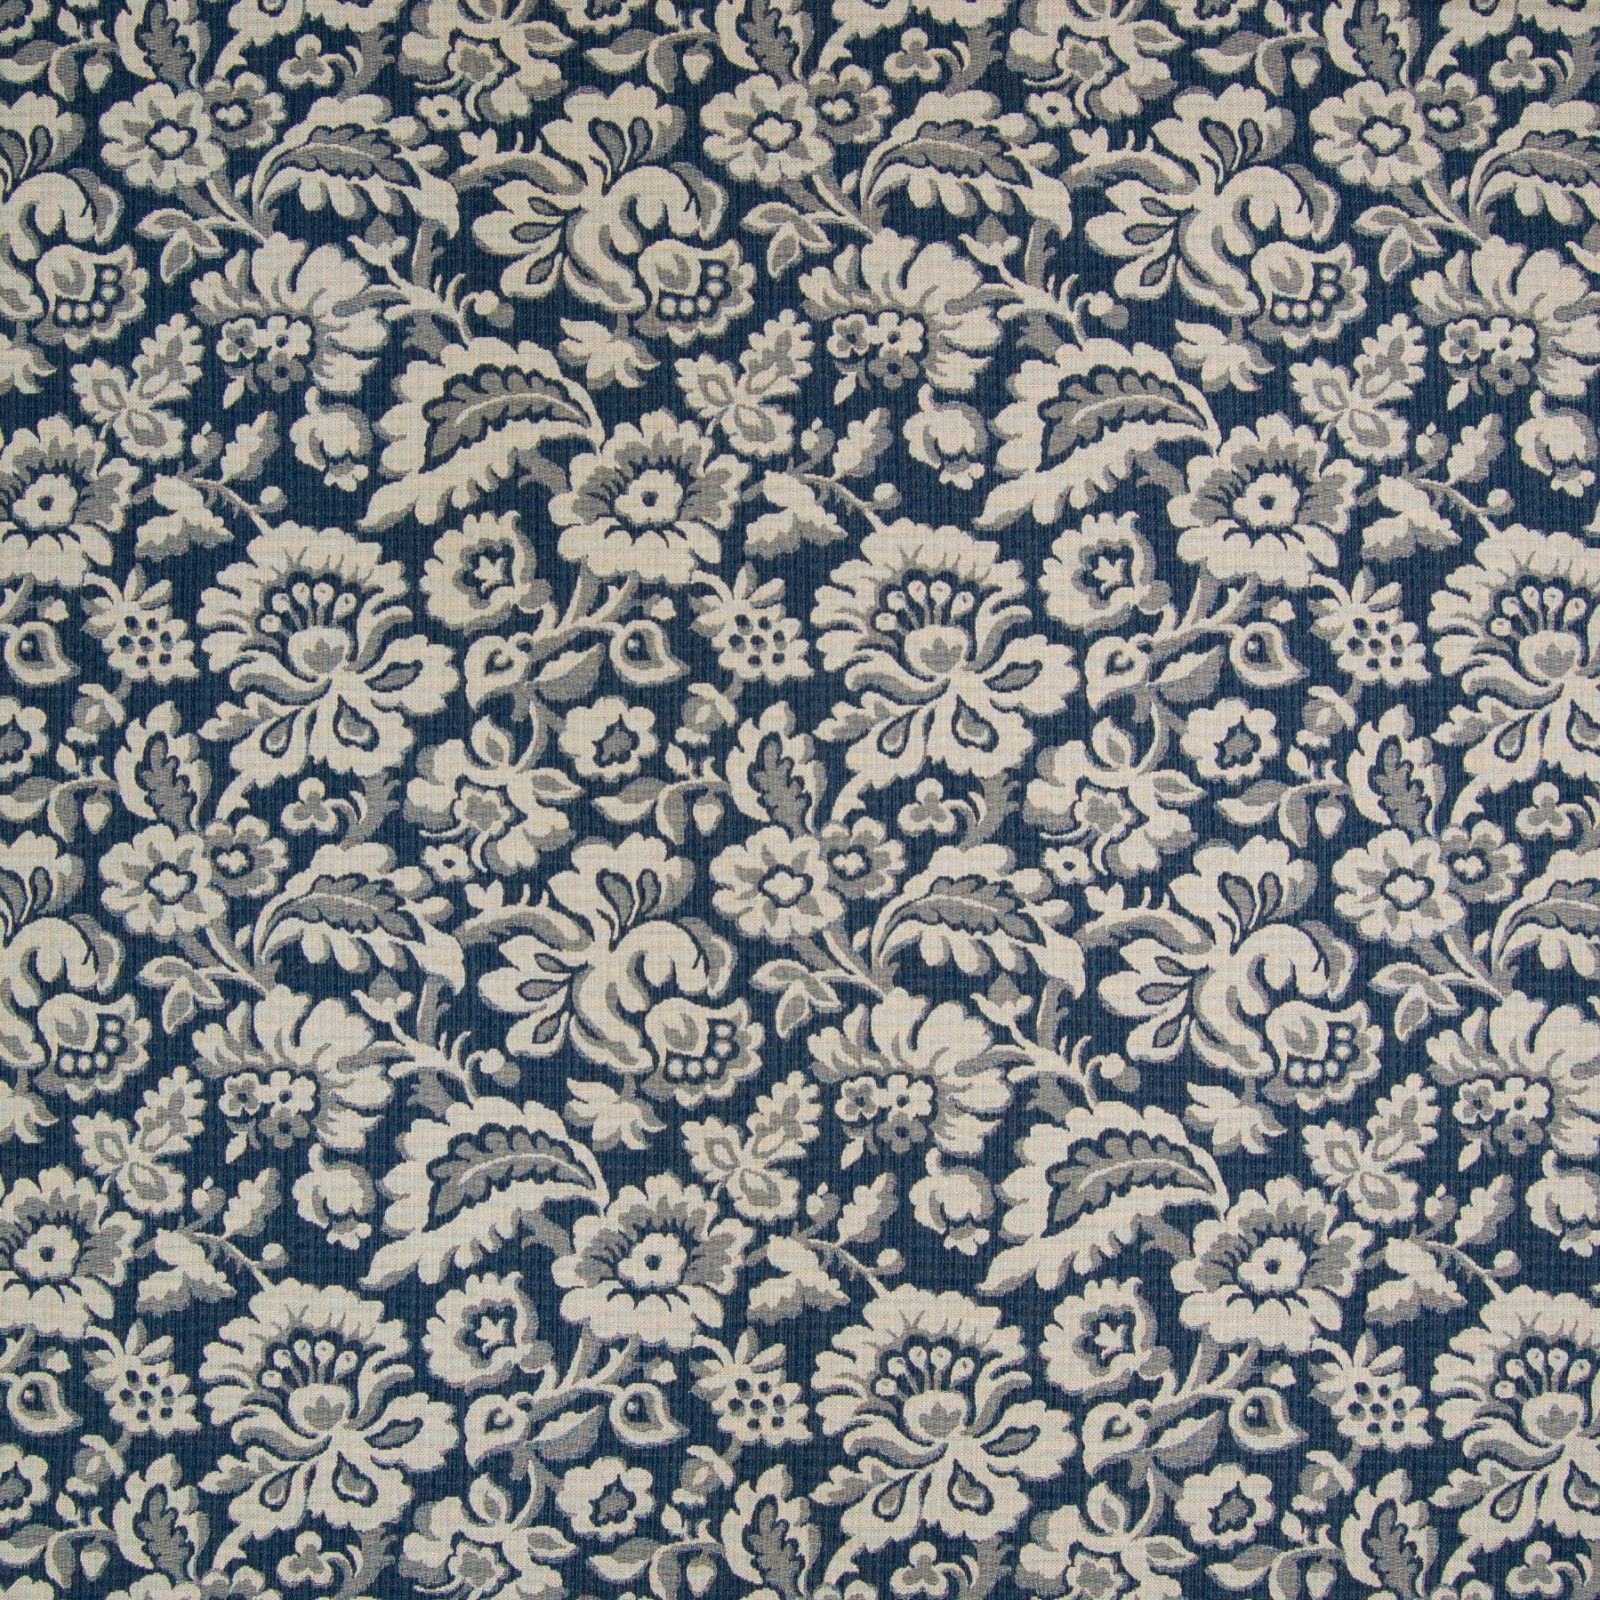 B2263 Indigo Greenhouse Fabrics